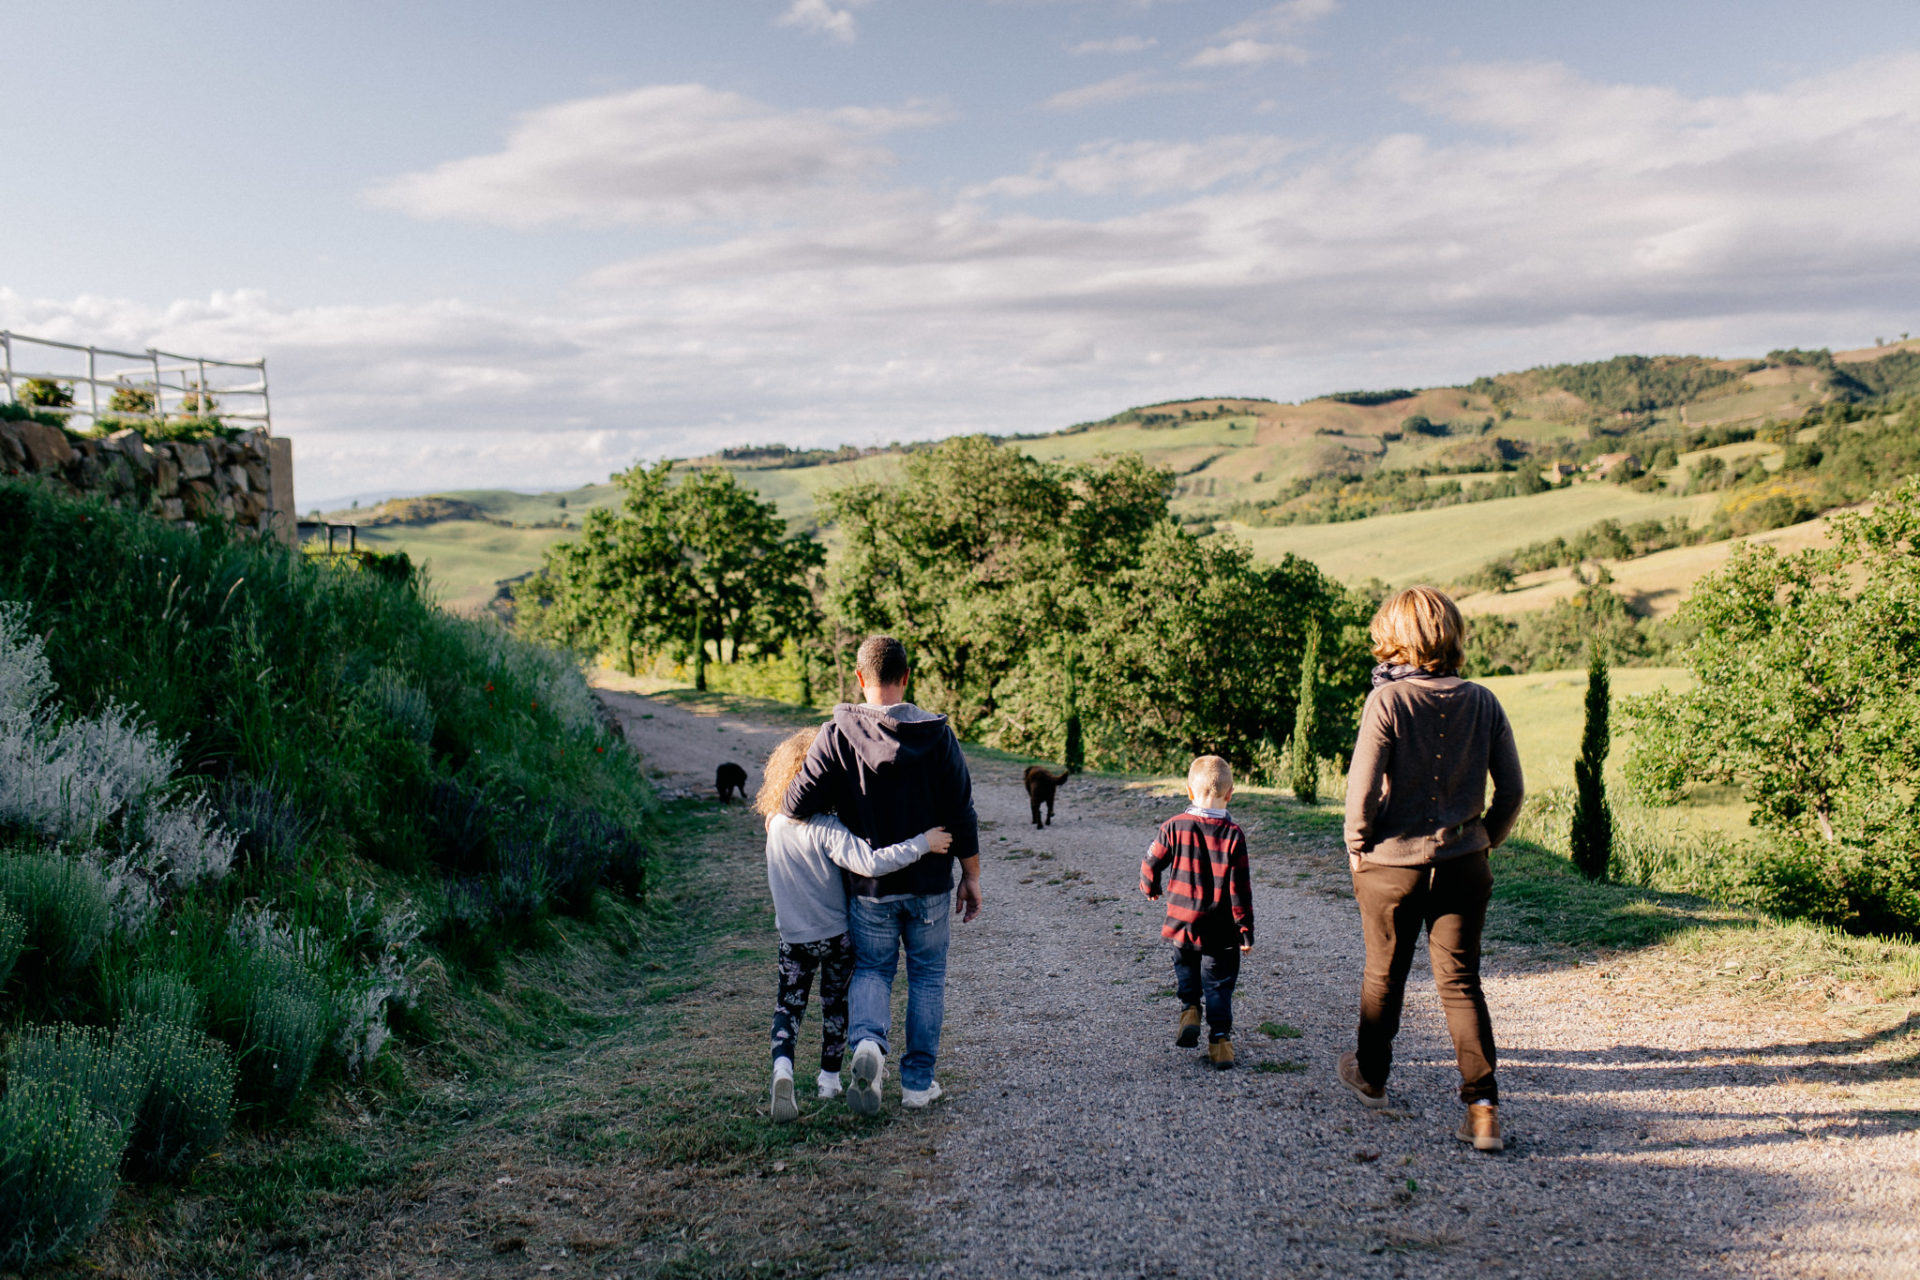 family photos holiday tuscany-dimora santa margherita-intimate portrait-family photographer stuttgart-labrador family dog children